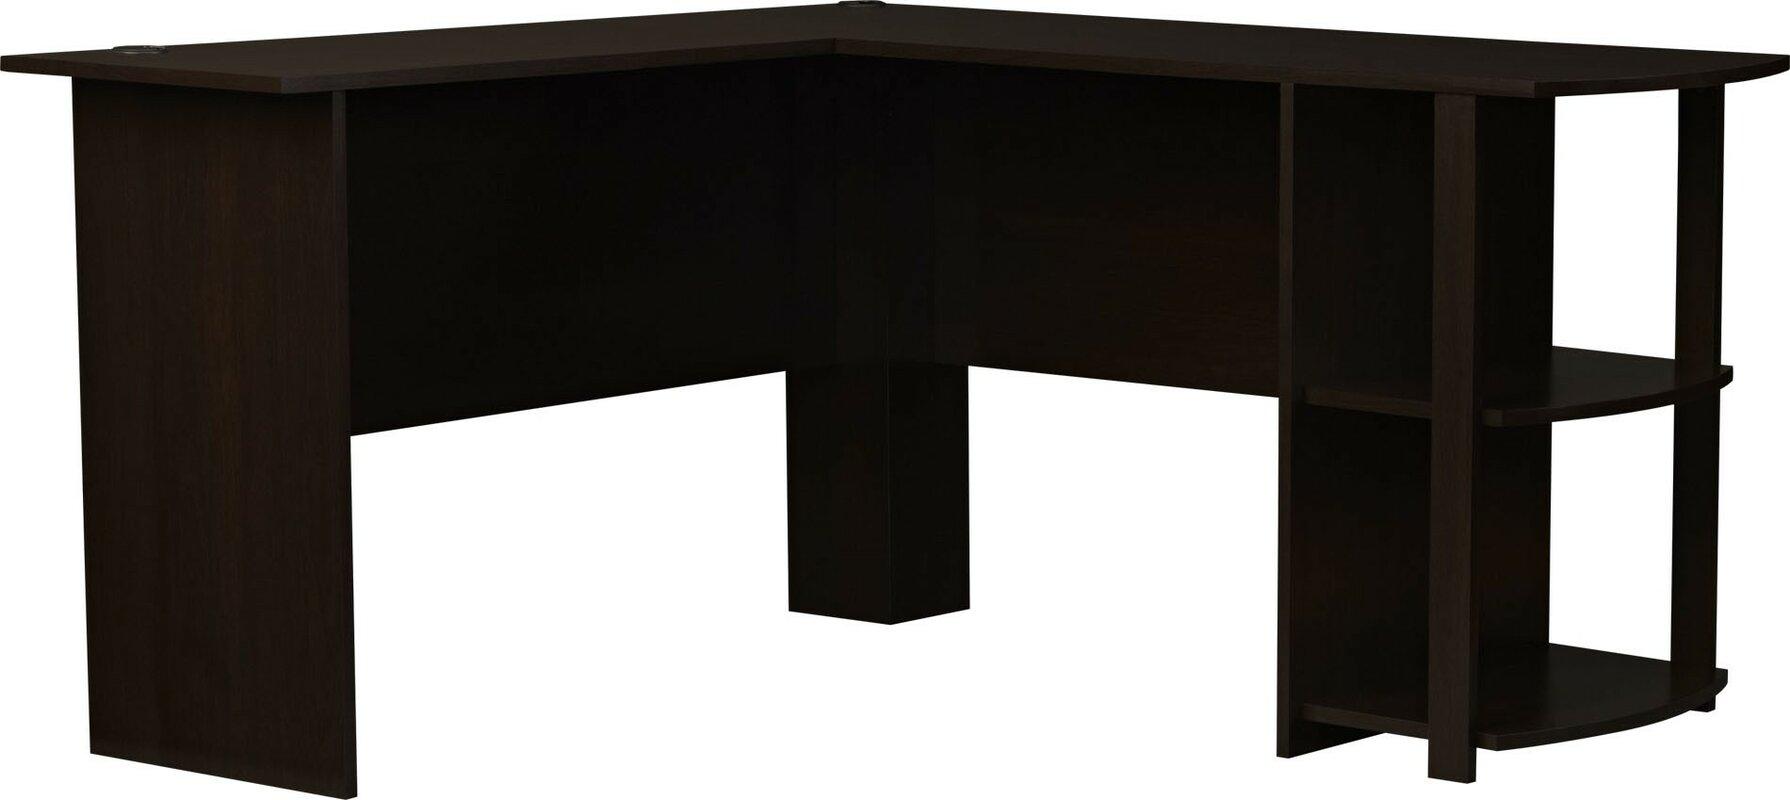 Salina L Shape Corner Desk Amp Reviews Joss Amp Main